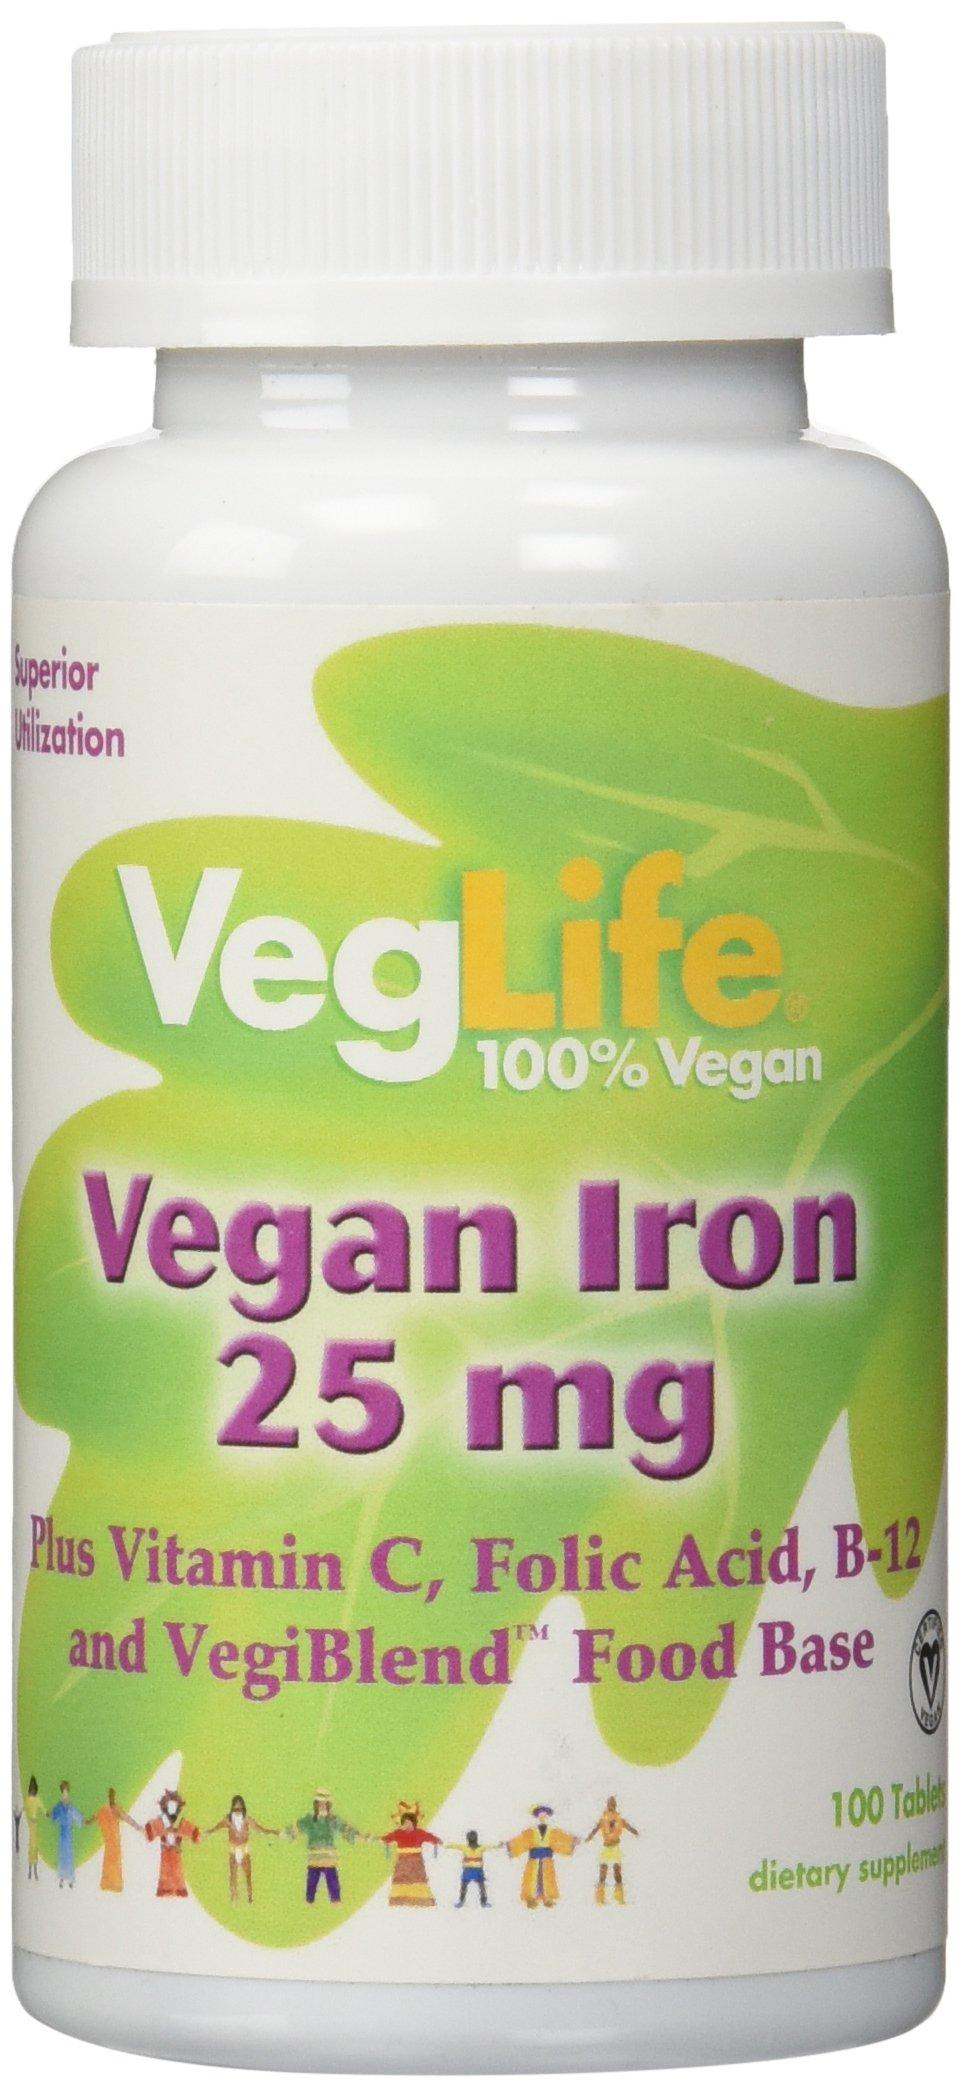 VegLife Iron Vegan Tablet, 25 mg, 100 Count